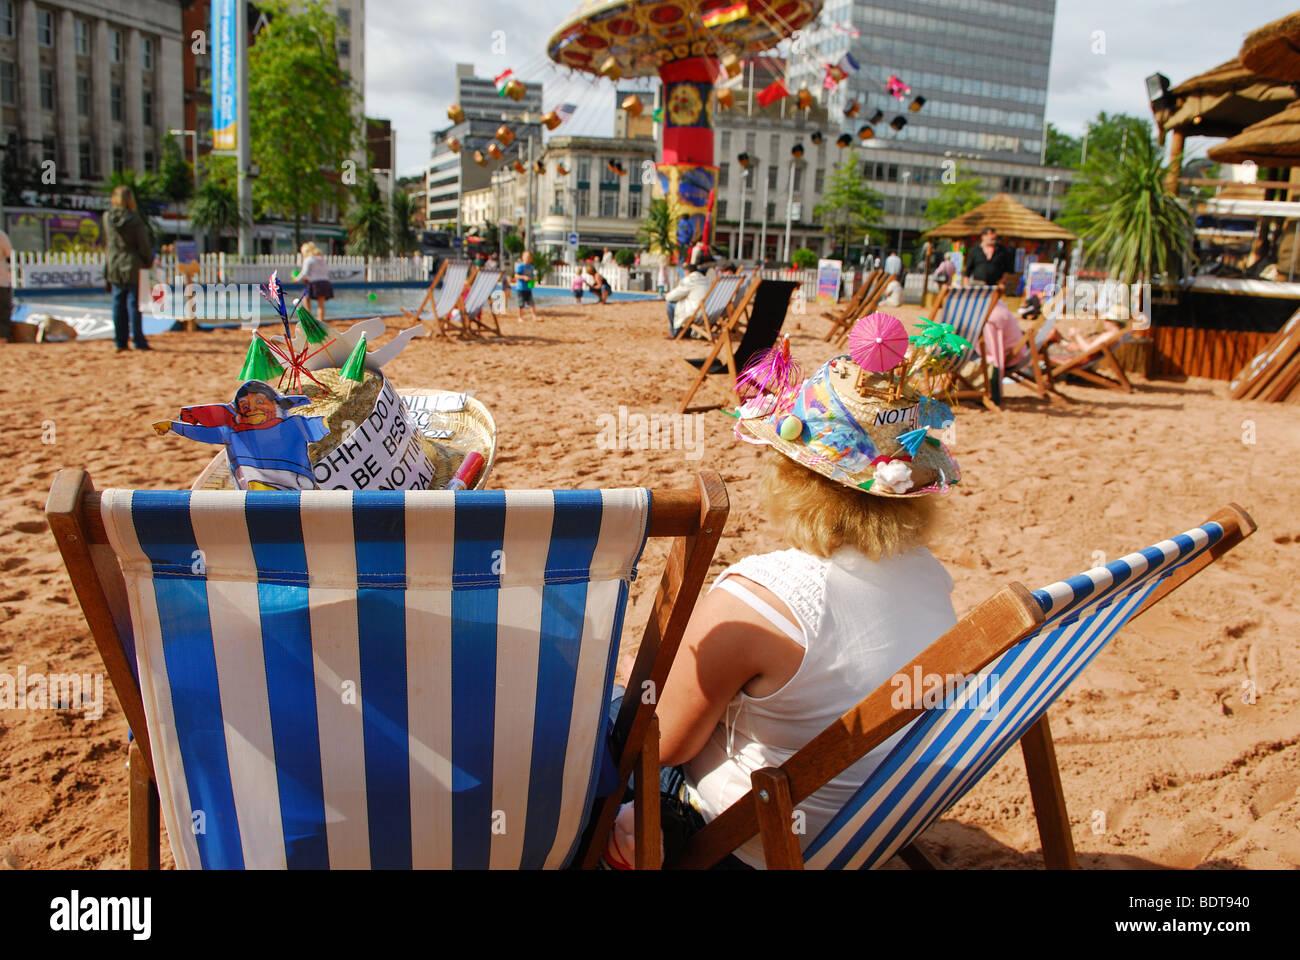 Nottingham Riviera. - Stock Image